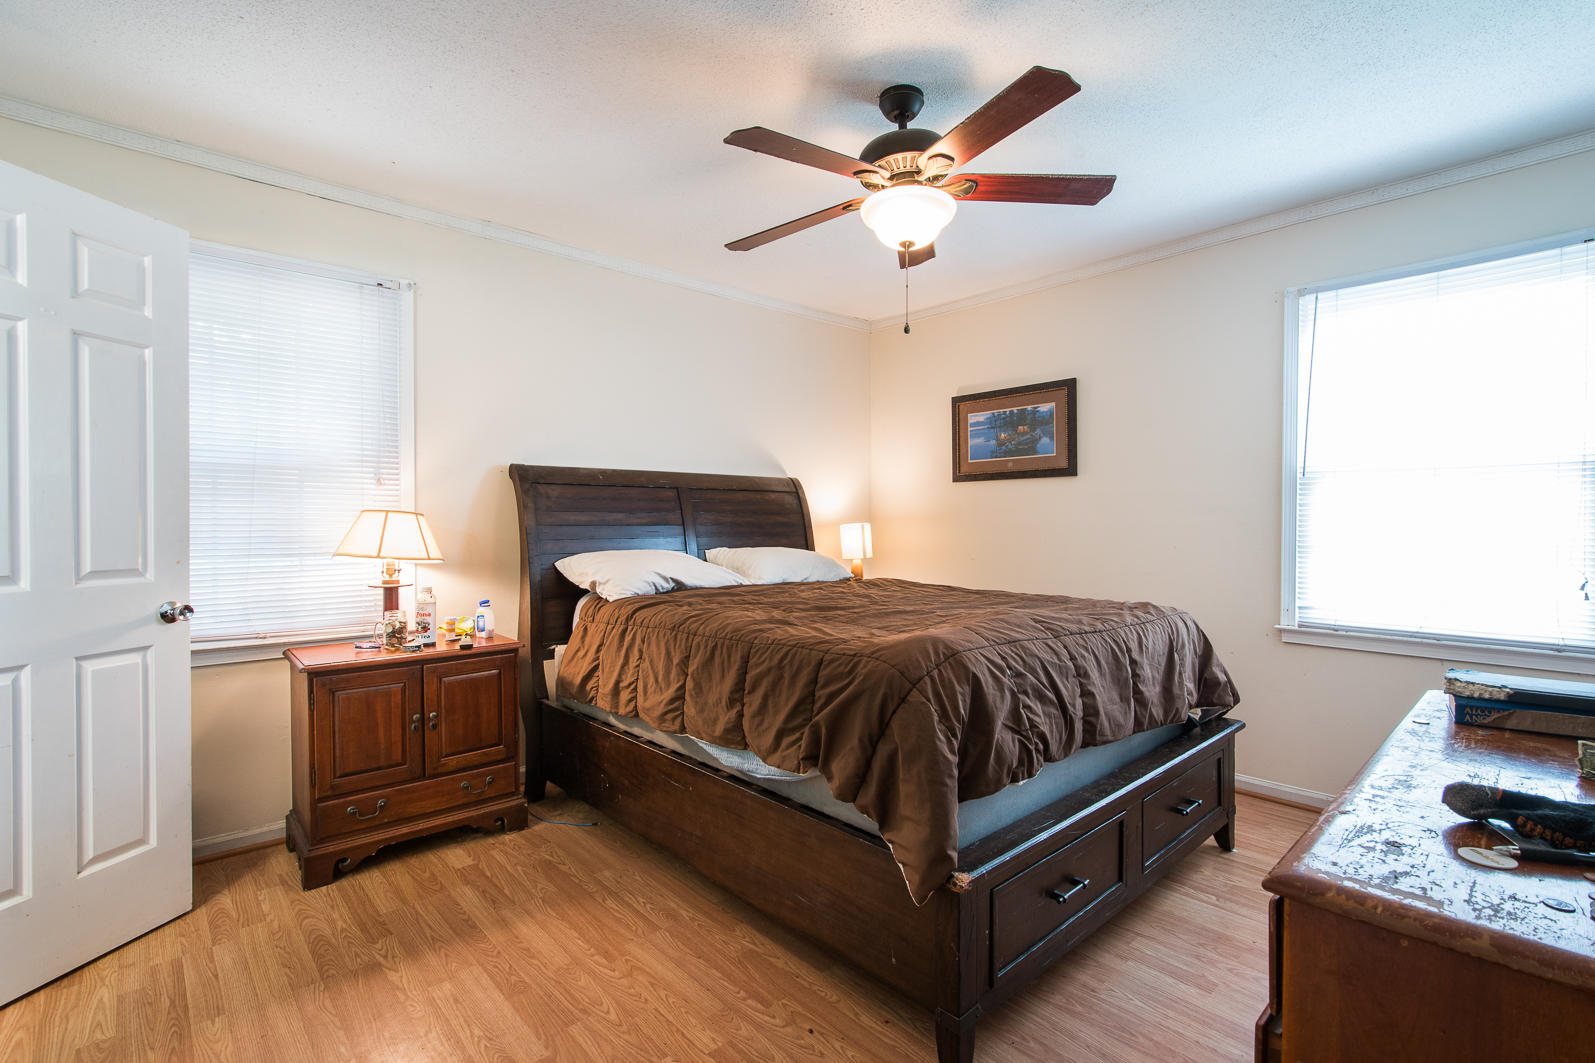 Wando East Homes For Sale - 1605 Babington, Mount Pleasant, SC - 22